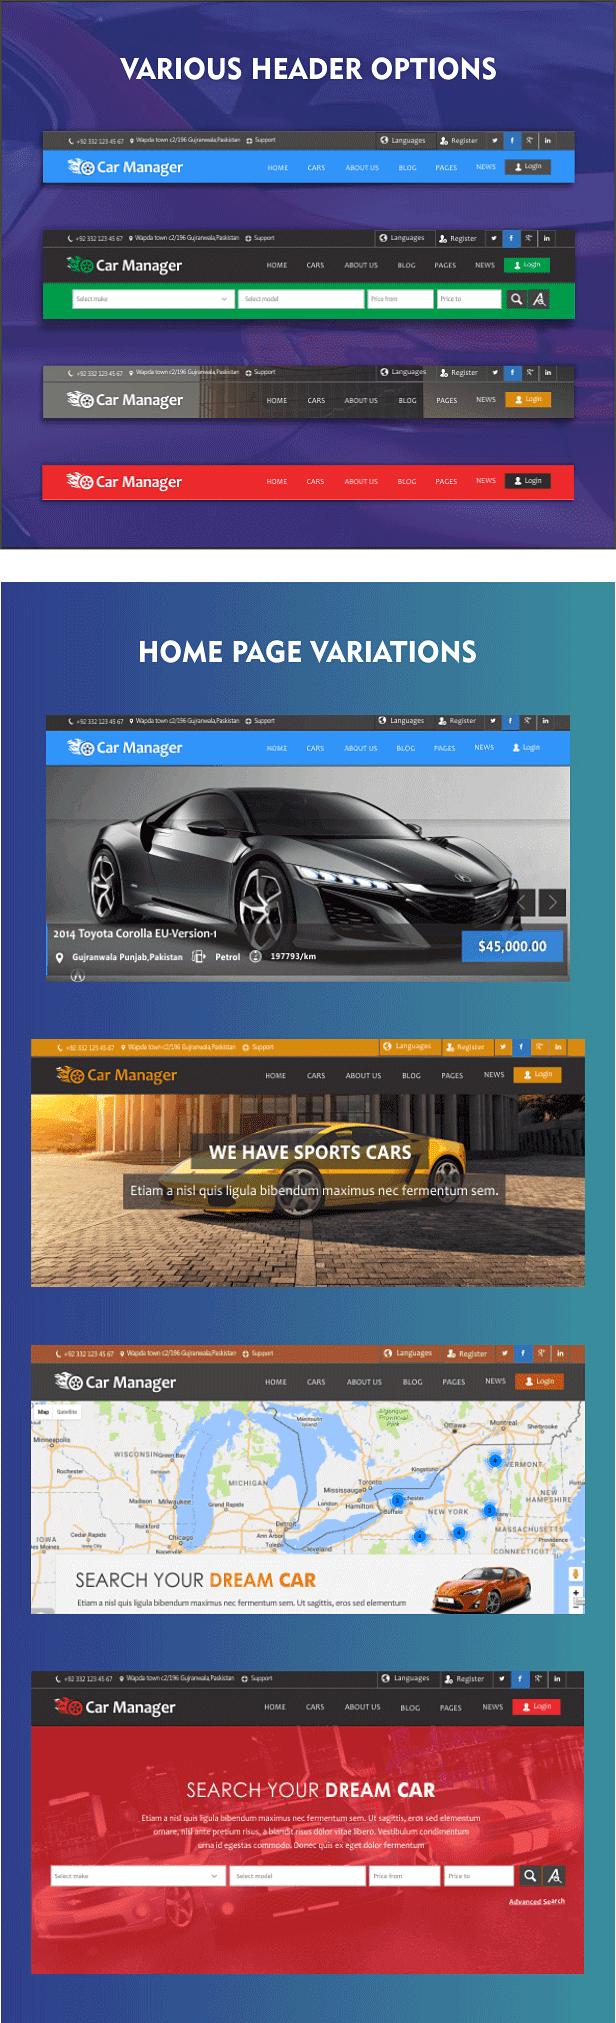 Car Manager - Car Dealership Business WordPress Theme - 6